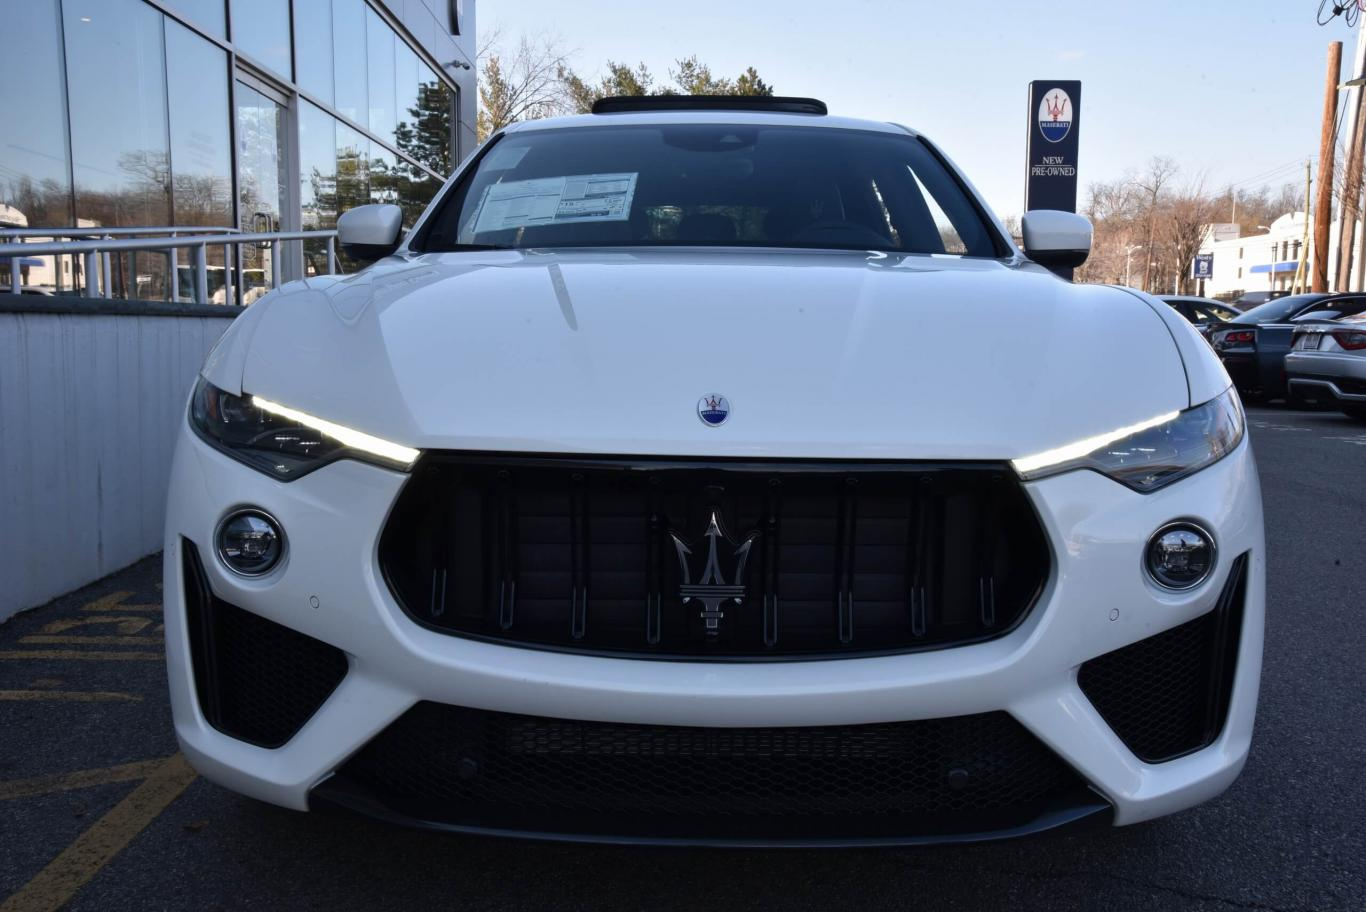 Maserati Levante Trofeo 1 Of 50. AWD.